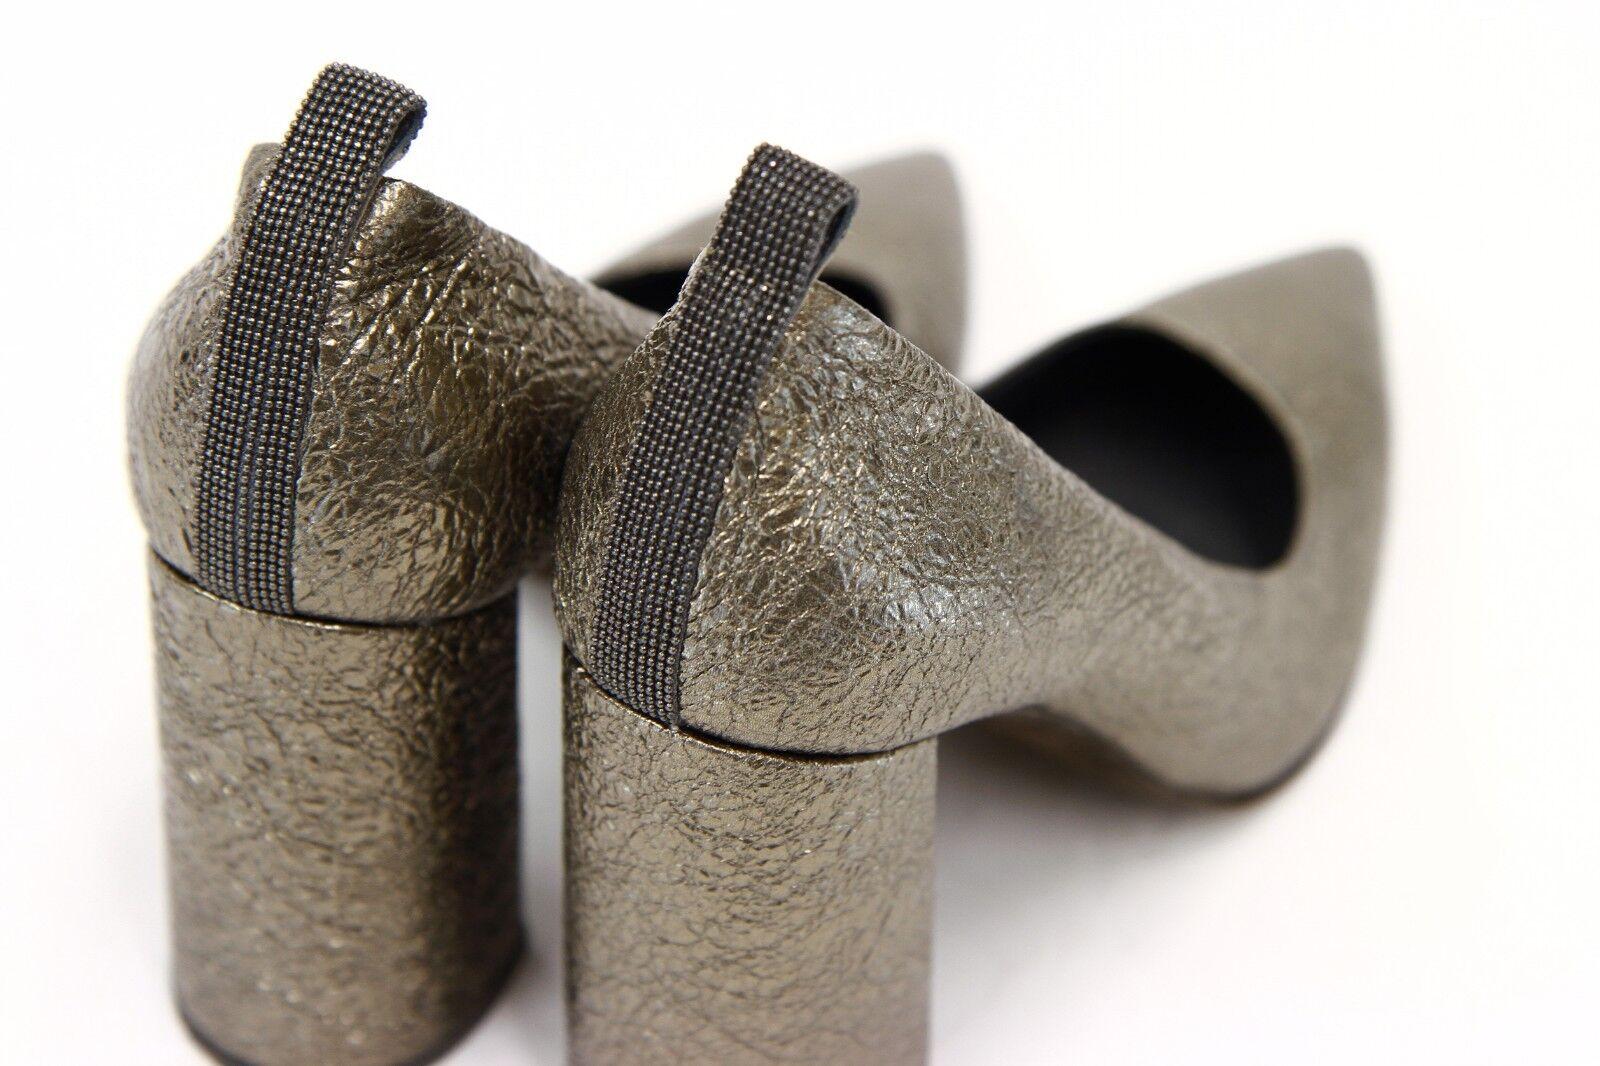 NWOB  1525 Brunello Cucinelli Metallic Leather Monili Beaded Beaded Beaded Pumps 37  7US  A181 883d72